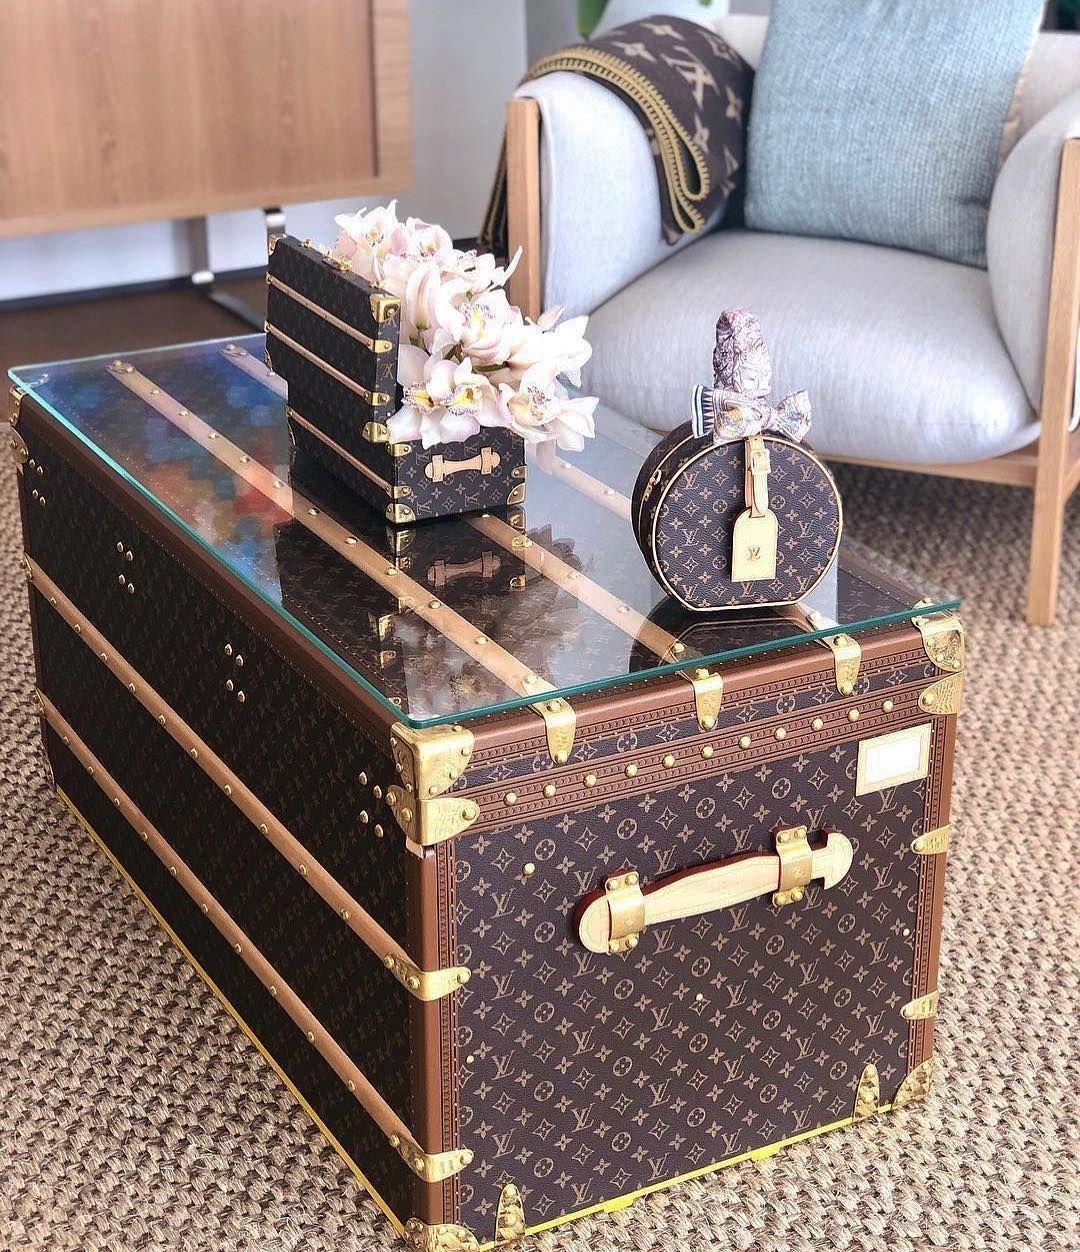 Designer Community On Instagram Lv Interior Louisvuitton Louis Vuitton Trunk Louis Vuitton Louis Vuitton Bag